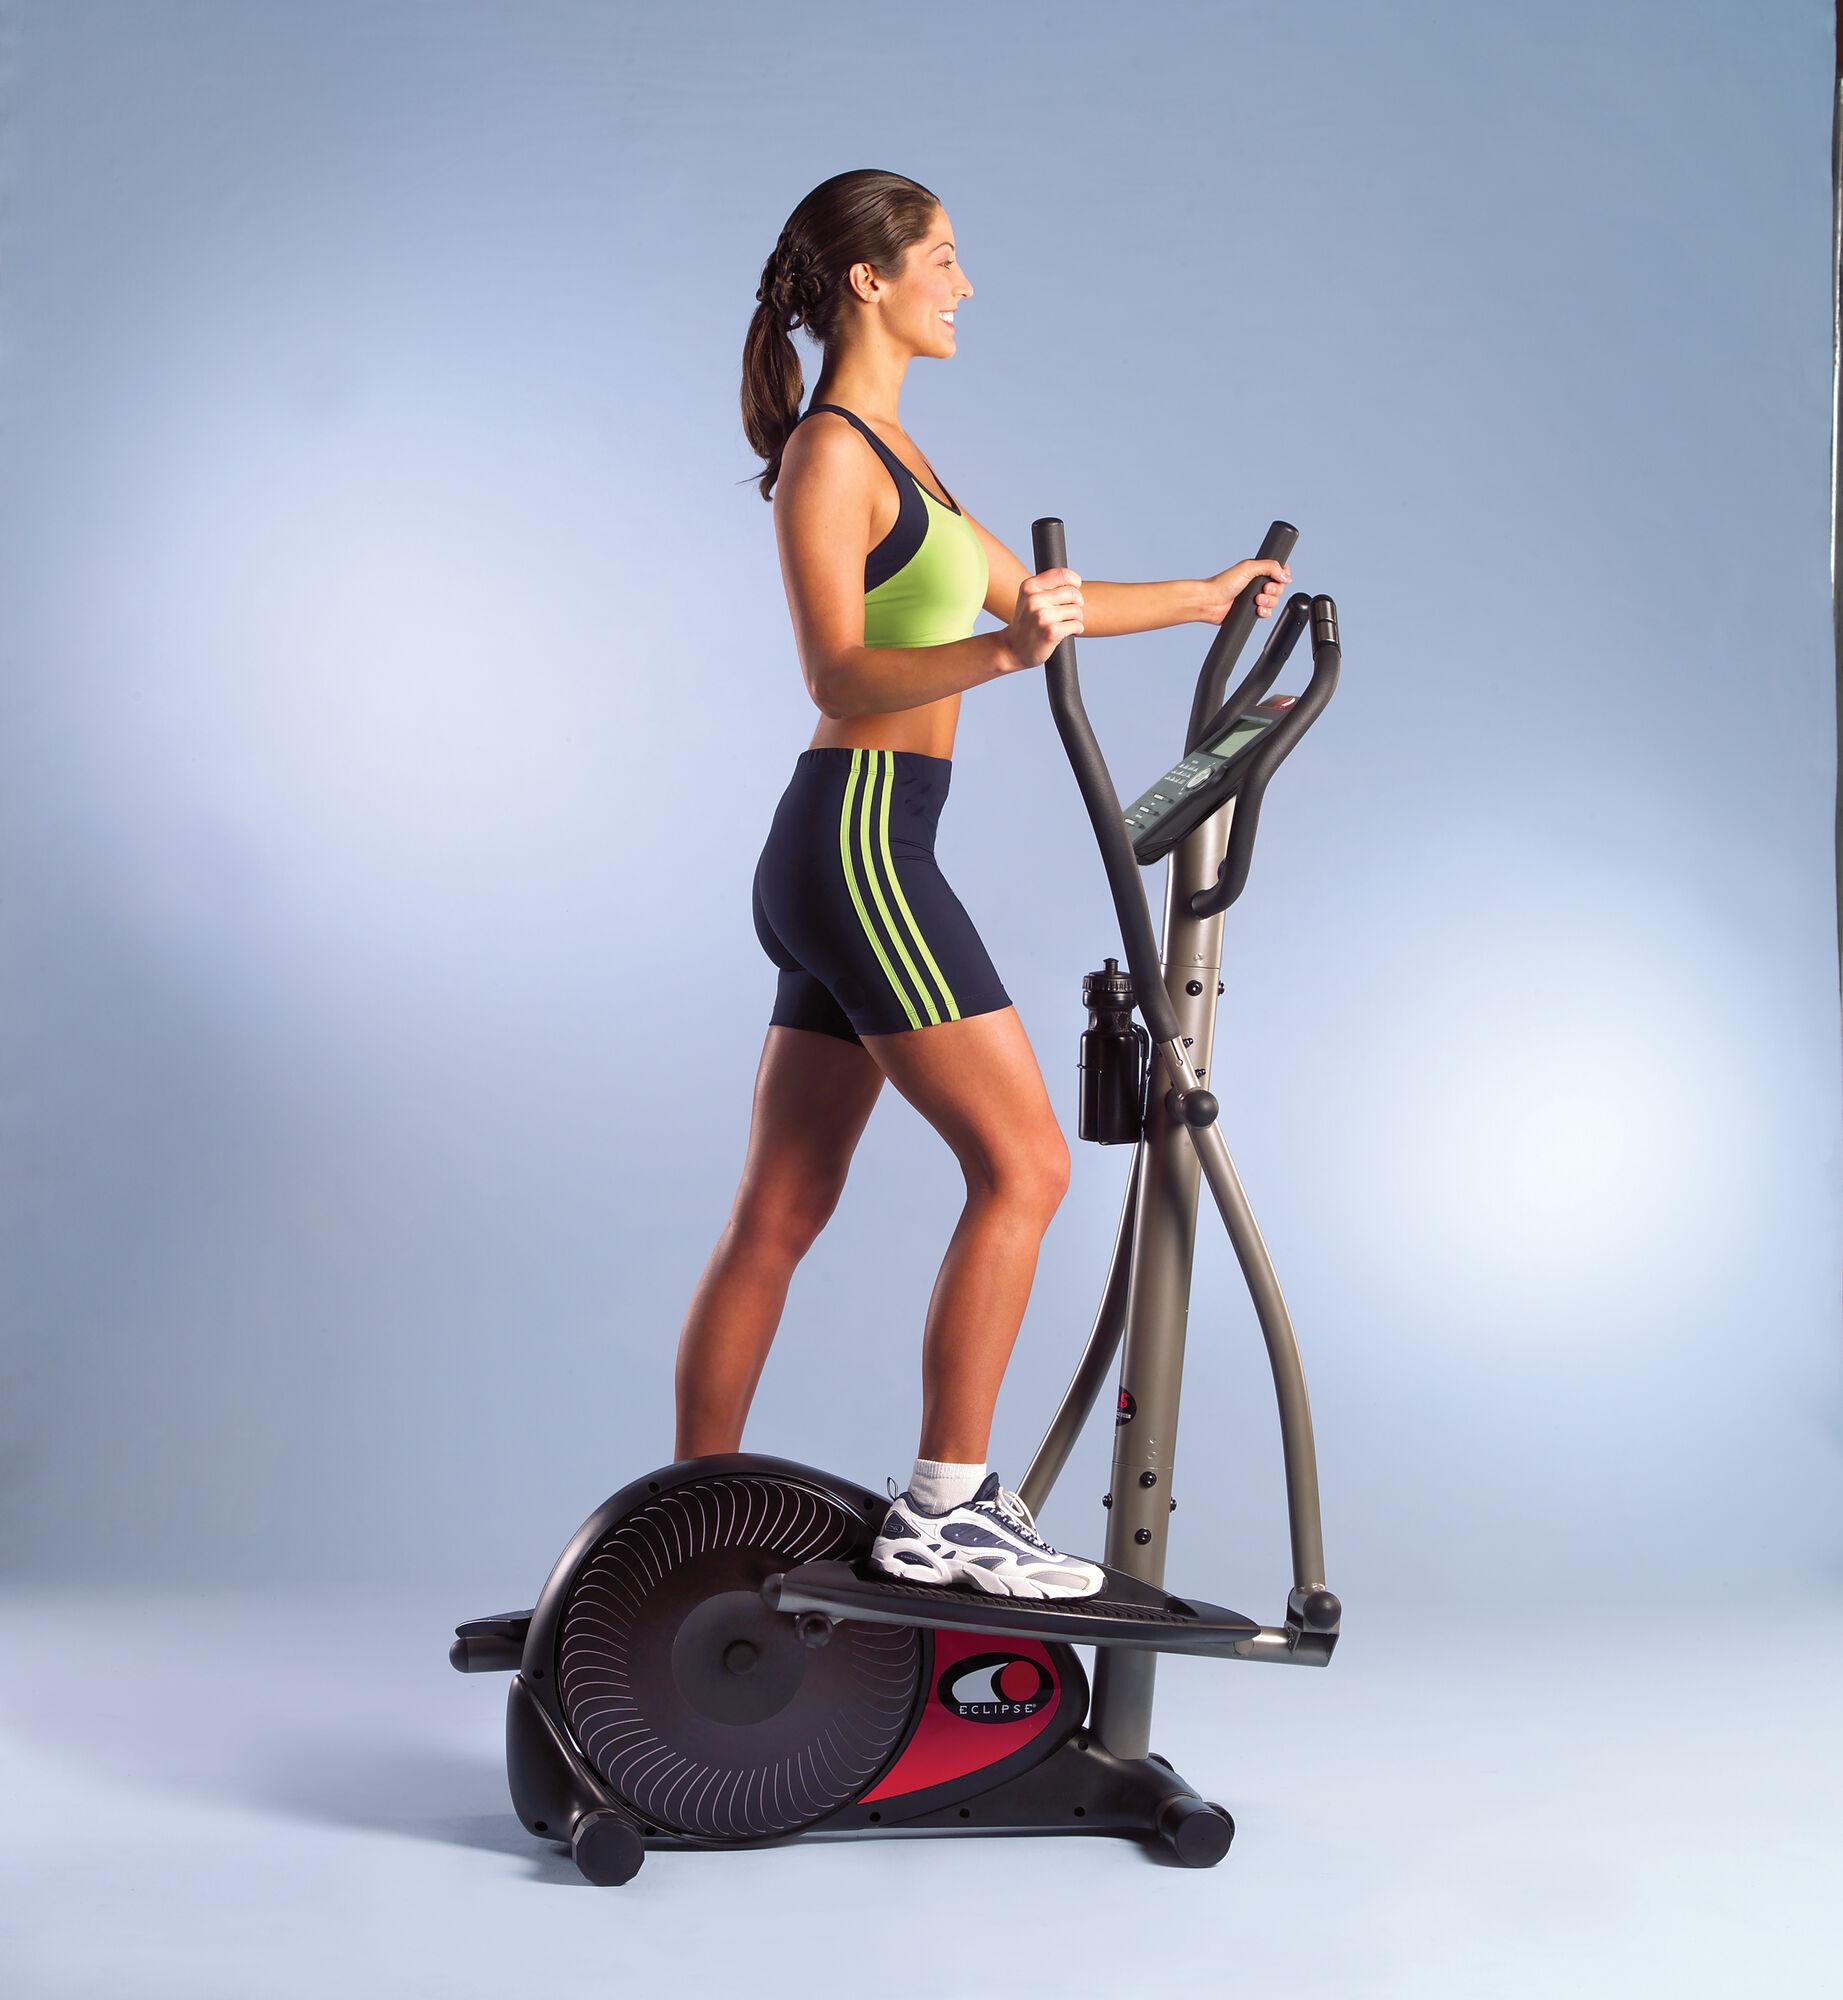 Cybex Treadmill Weight Loss Program: Elliptical Machines, Crosstrainers, Ellipticals